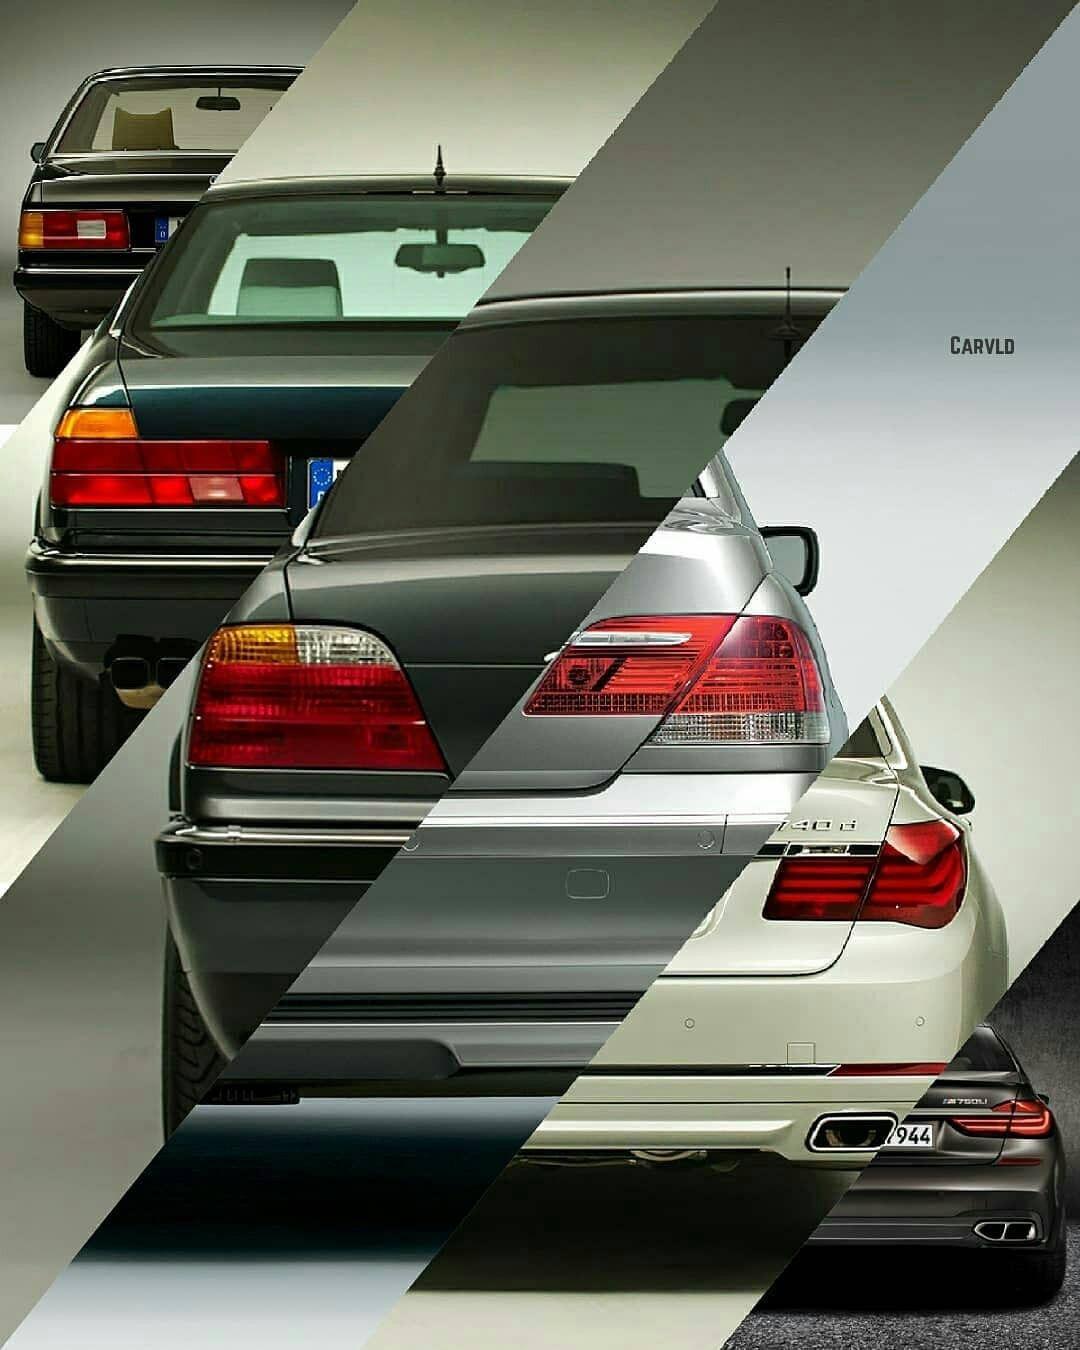 2002 Mercedes Benz Clk Gtr Super Sport Gallery: Pin By CarHub On #Audi #BMW #Mercedes-Benz